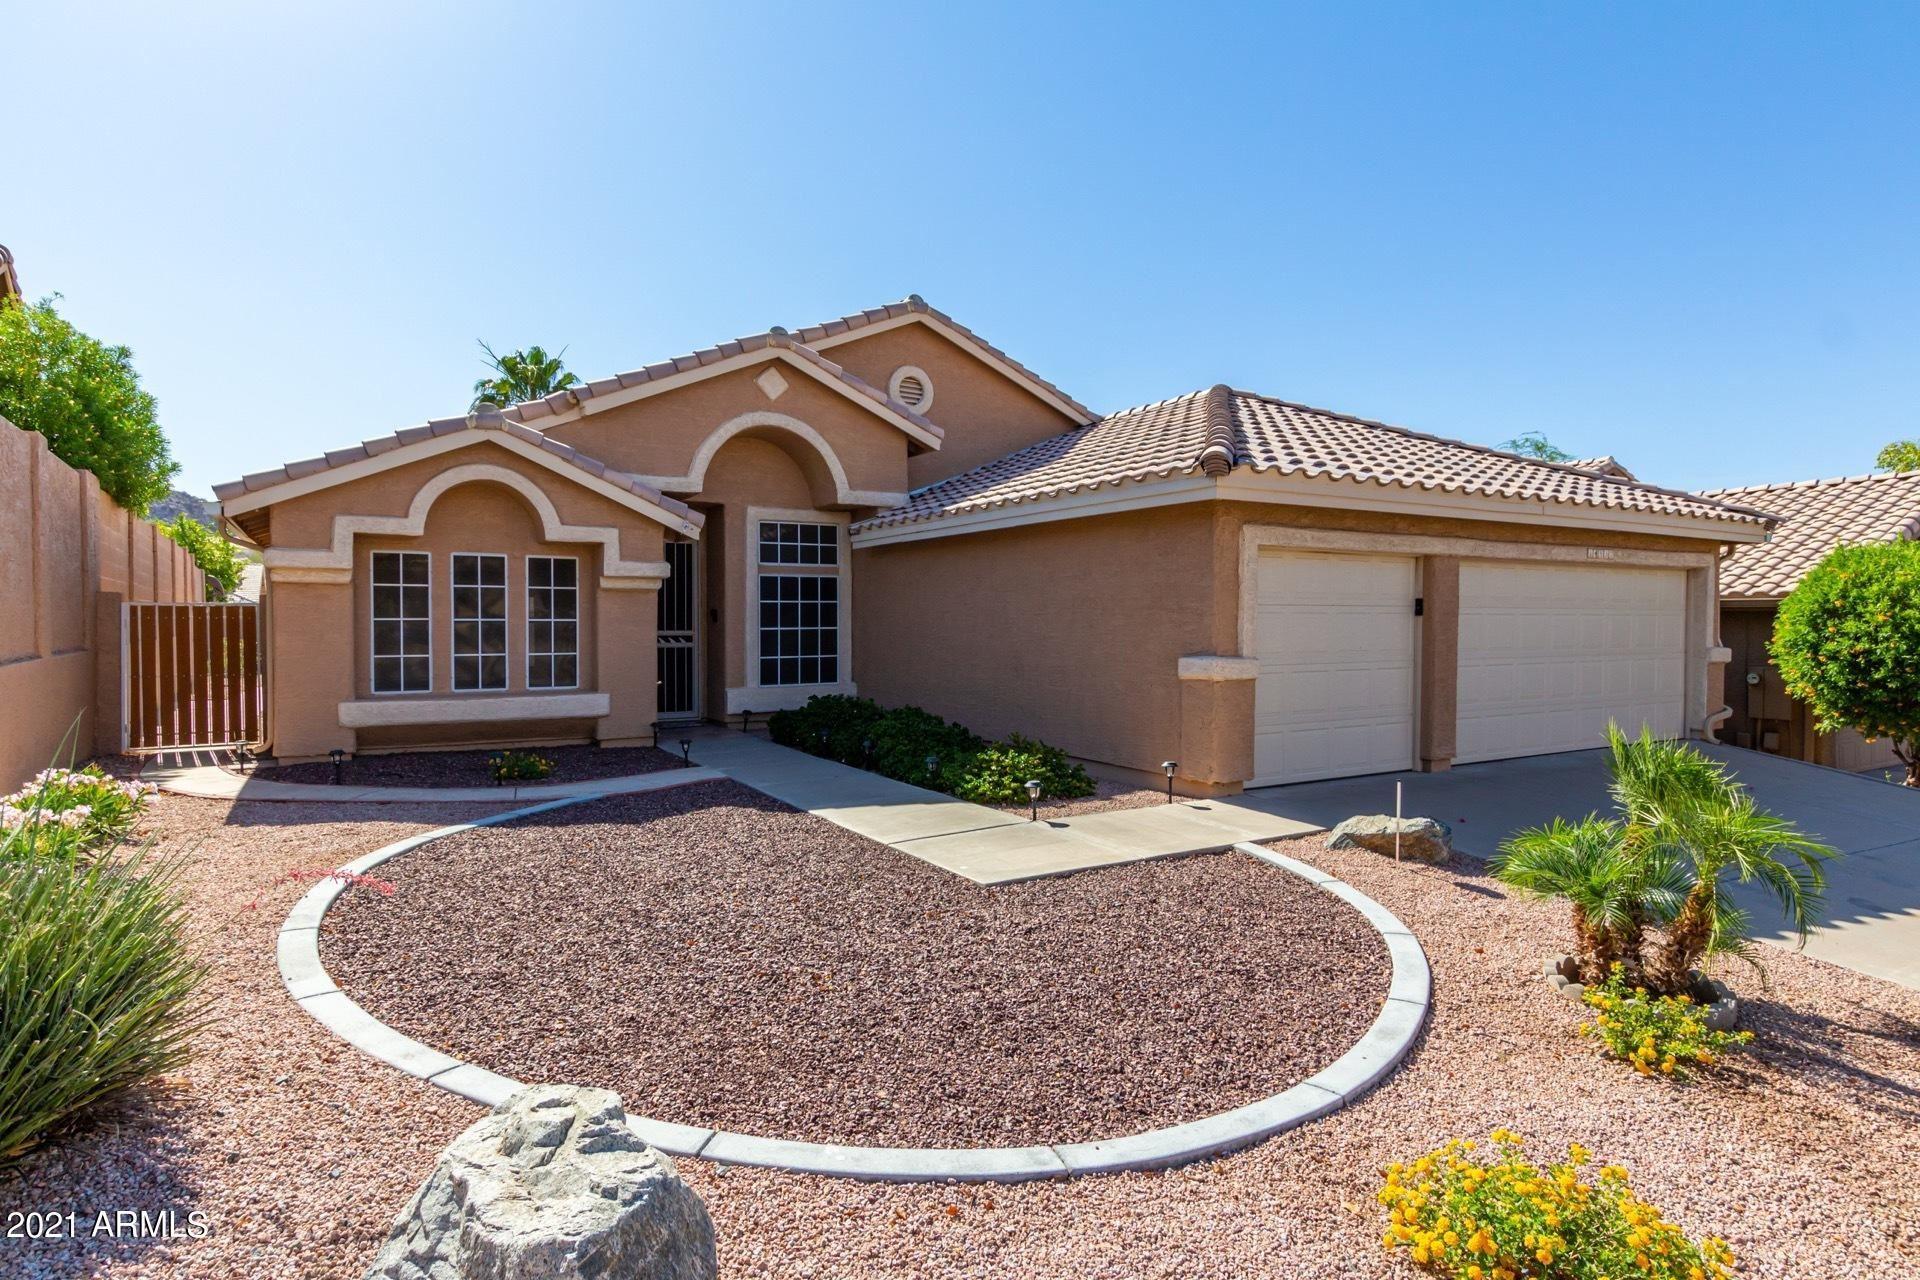 14837 S 8TH Street, Phoenix, AZ 85048 - MLS#: 6245811